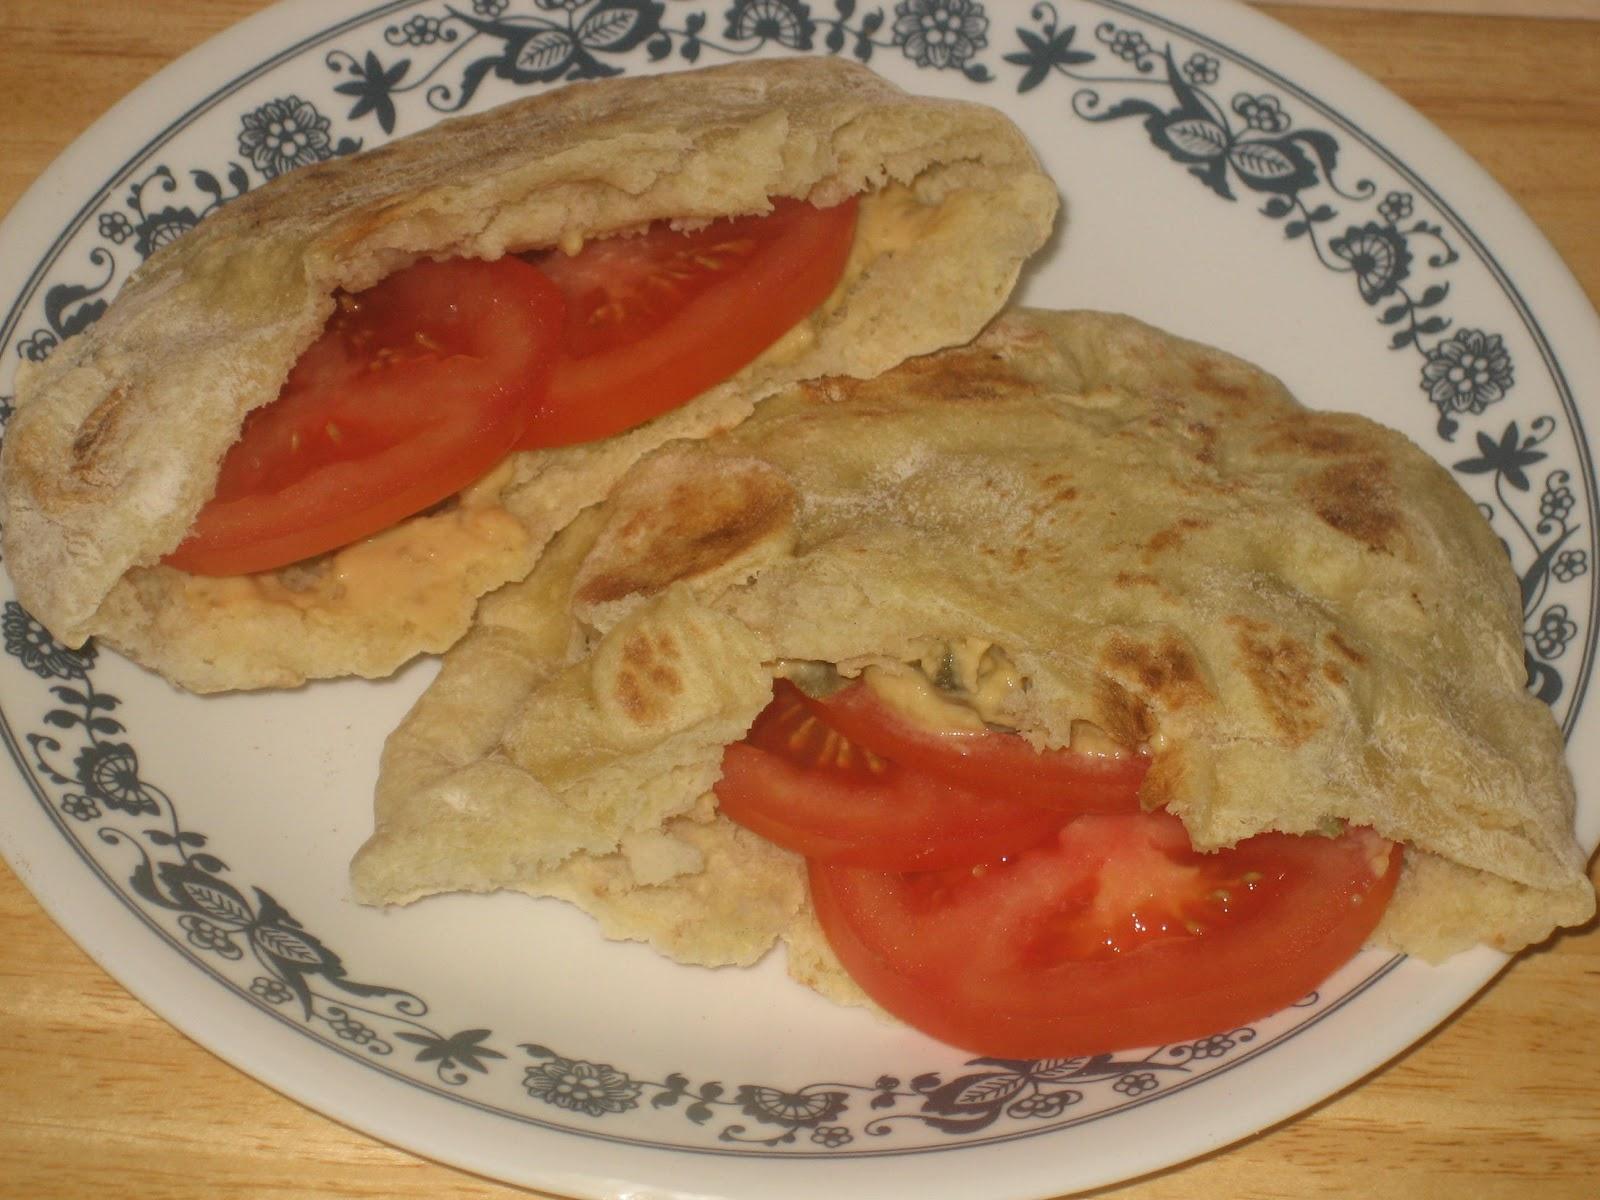 stuffedveggies: Hummus with Capers